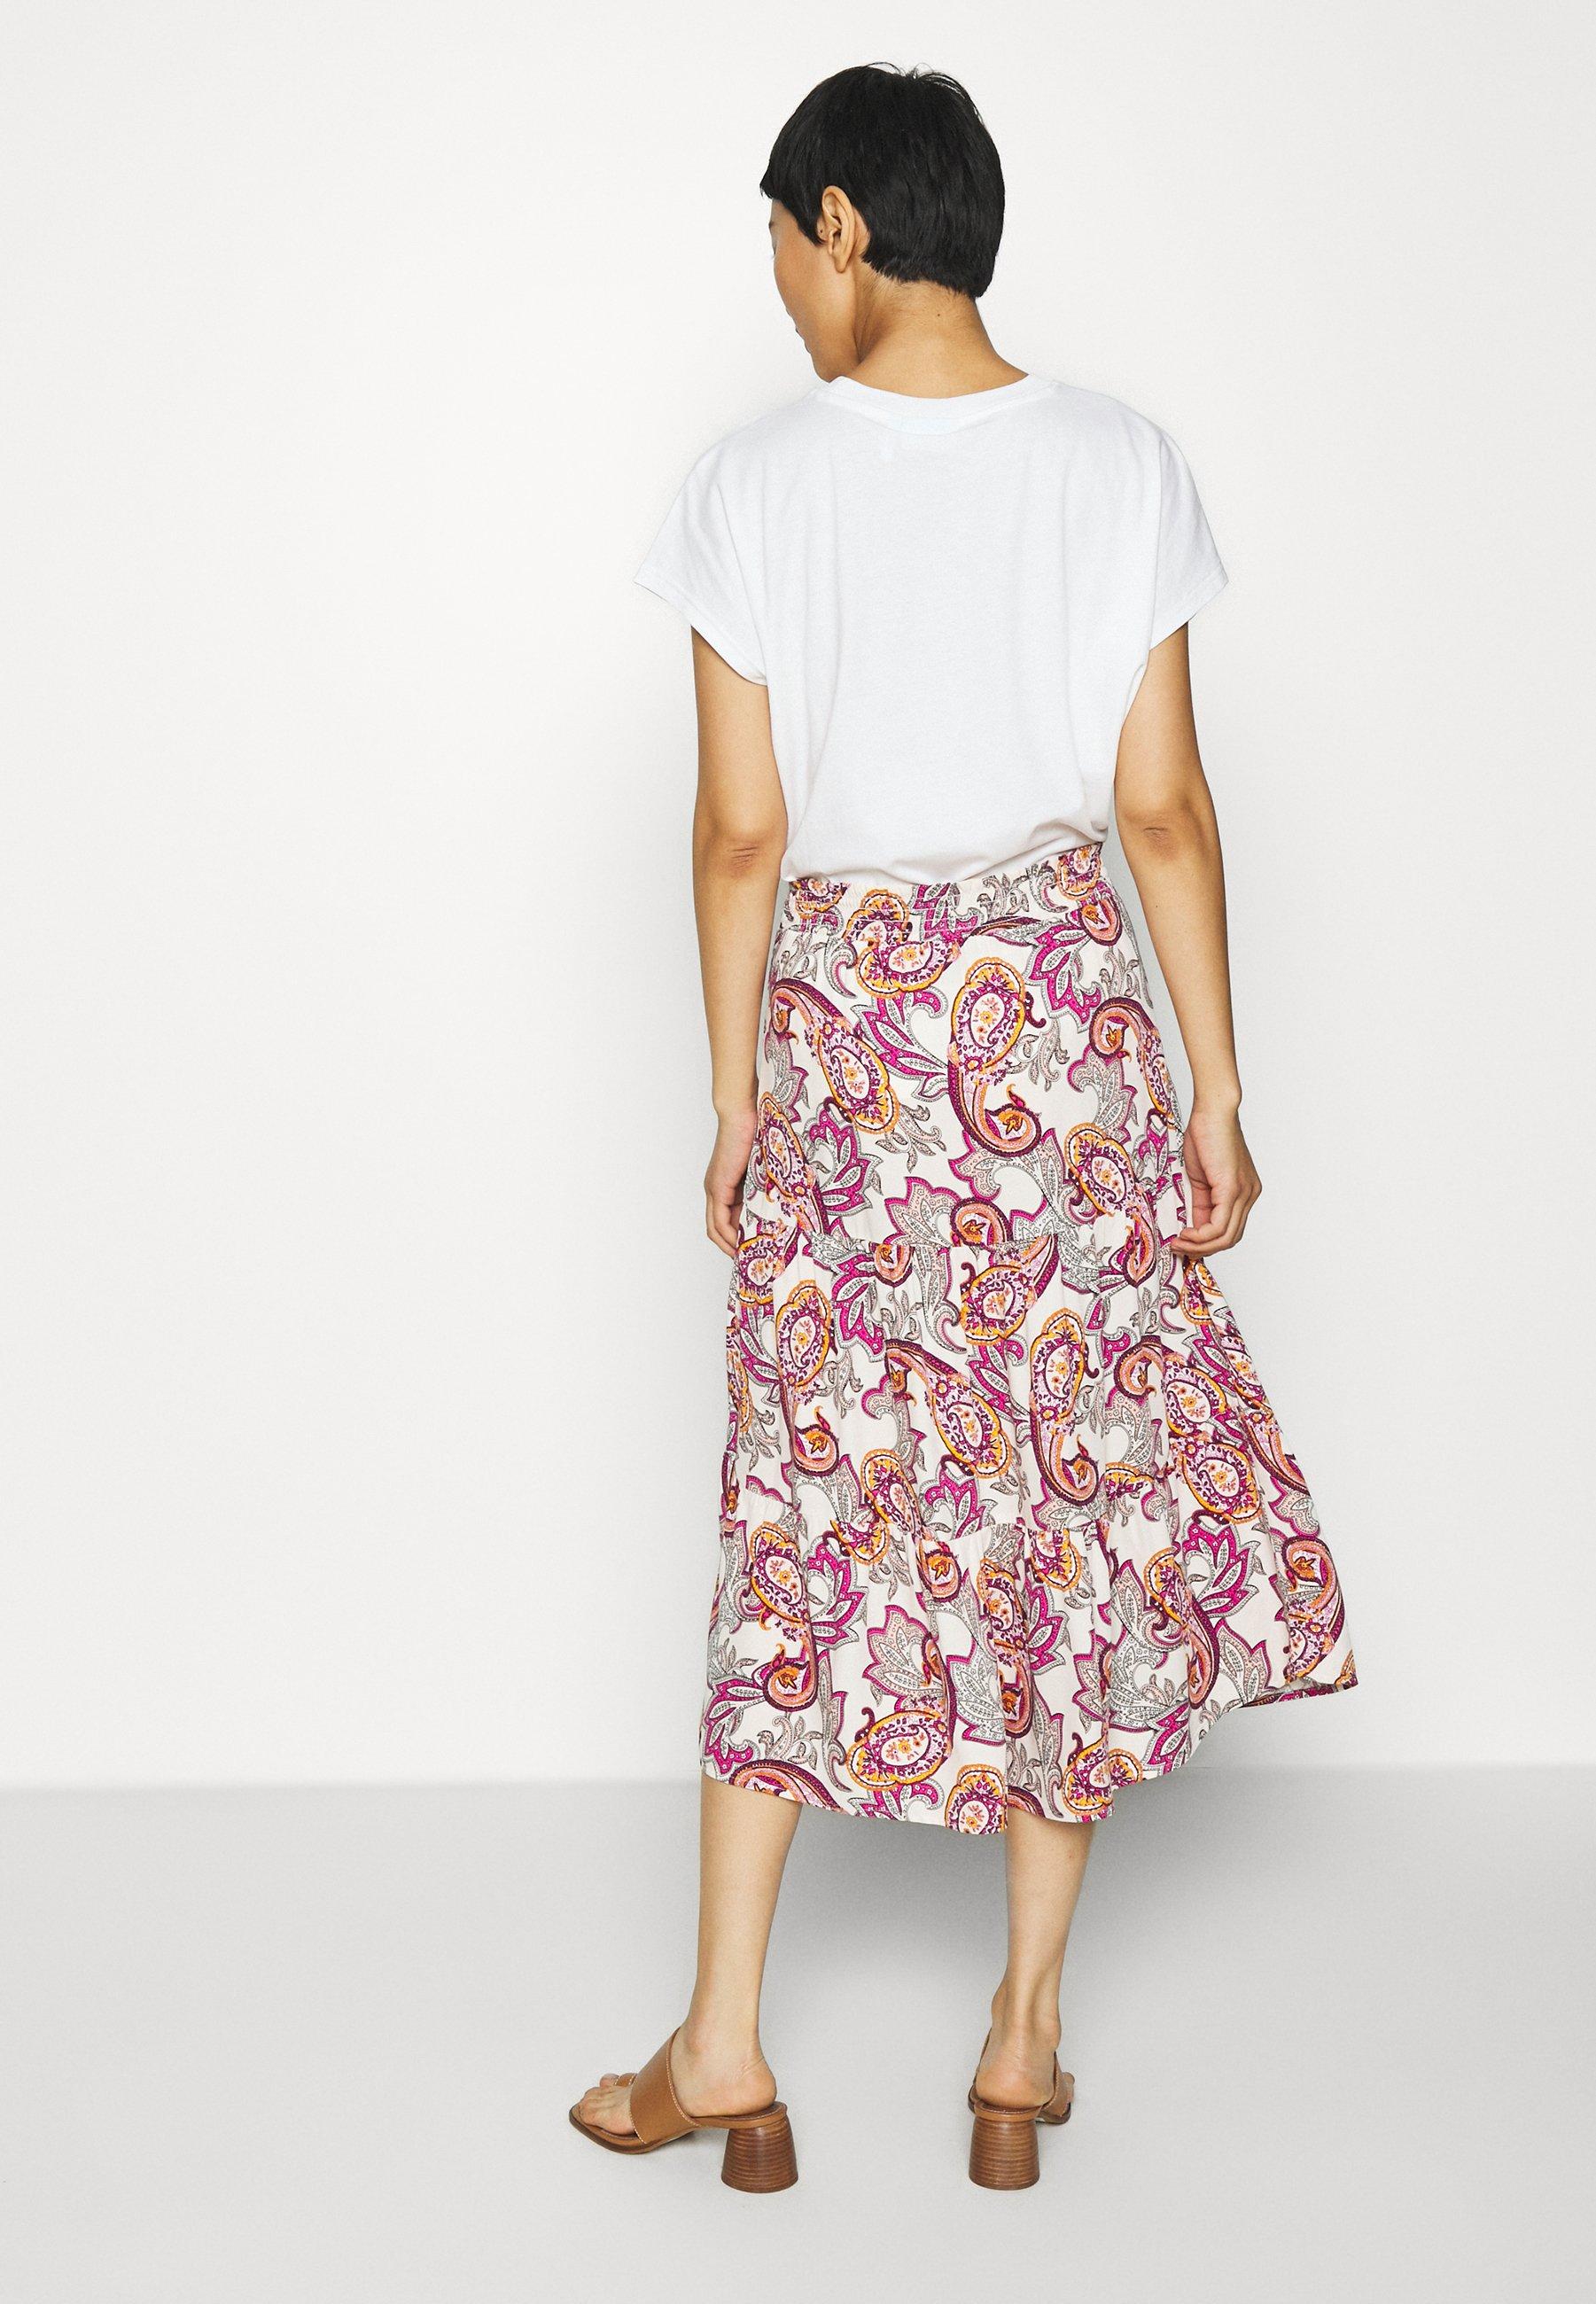 Visit New Bulk Designs Women's Clothing comma A-line skirt light pink 0A7UpD4bE CT2Of11kV